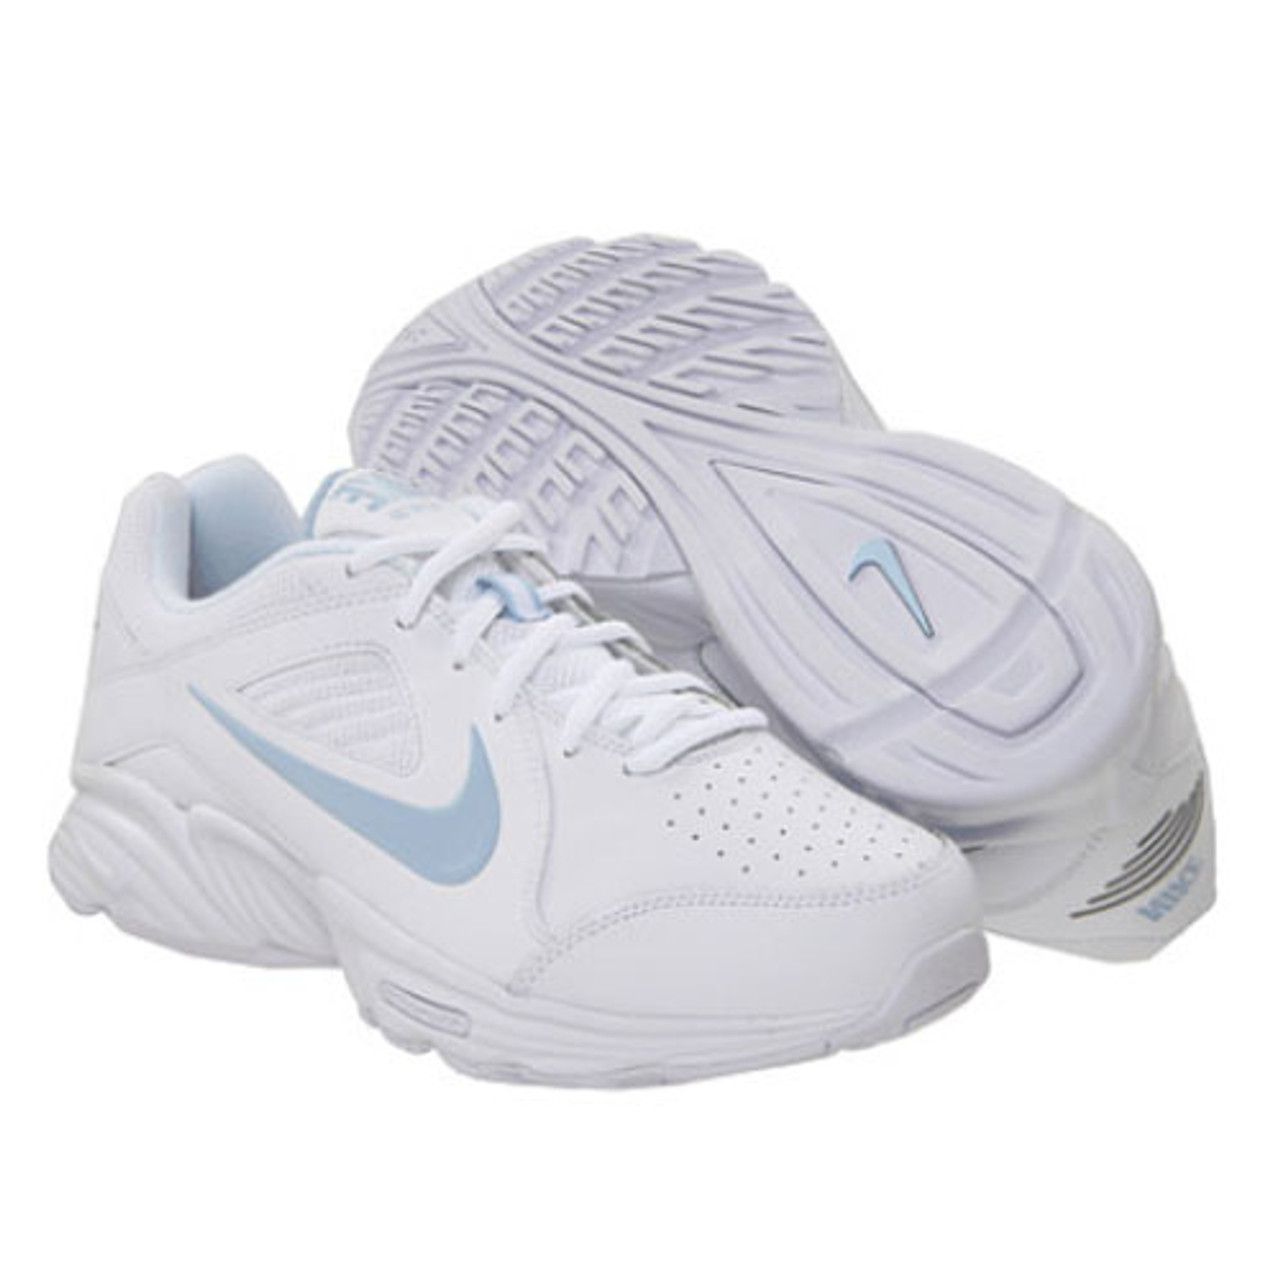 Rebobinar cumpleaños desfile  Nike View III White/Blue - | Discount Nike Ladies Athletic & More -  Shoolu.com | Shoolu.com